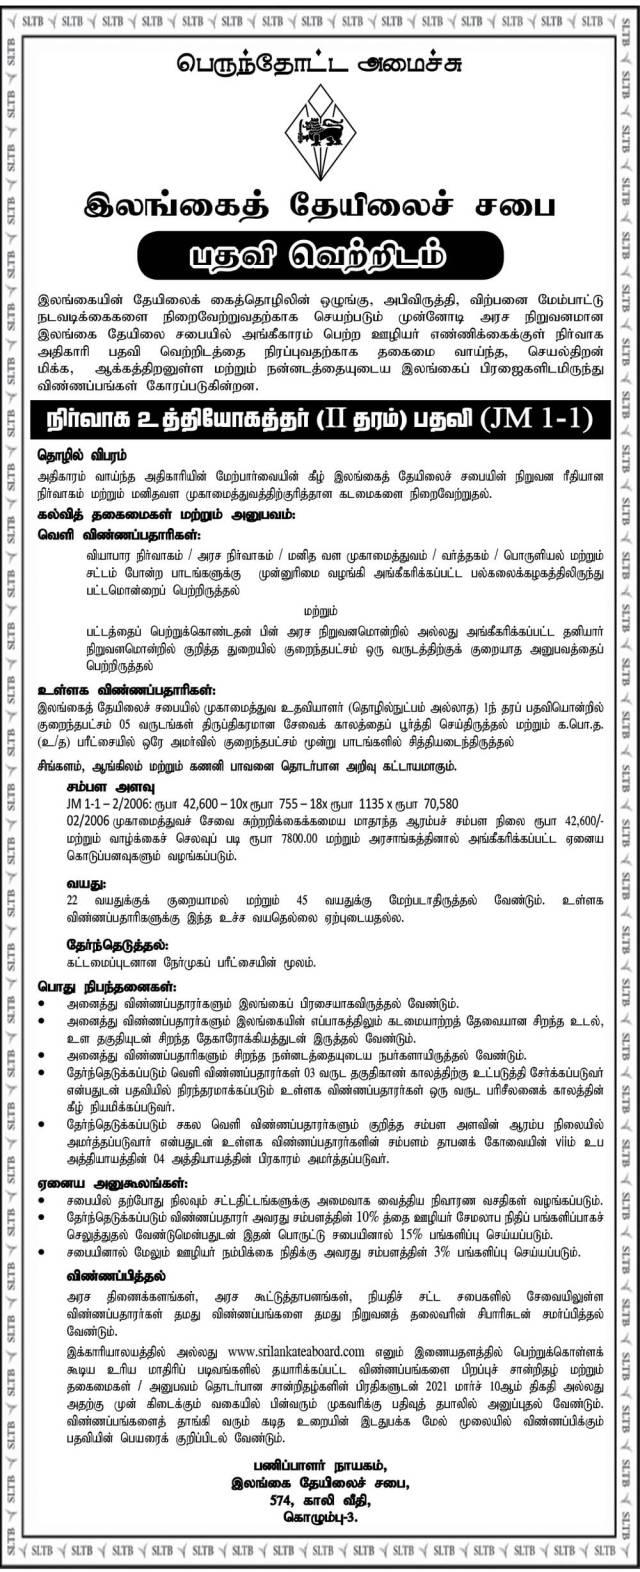 Administrative Officer Gr Ii- Sri Lanka Tea Board